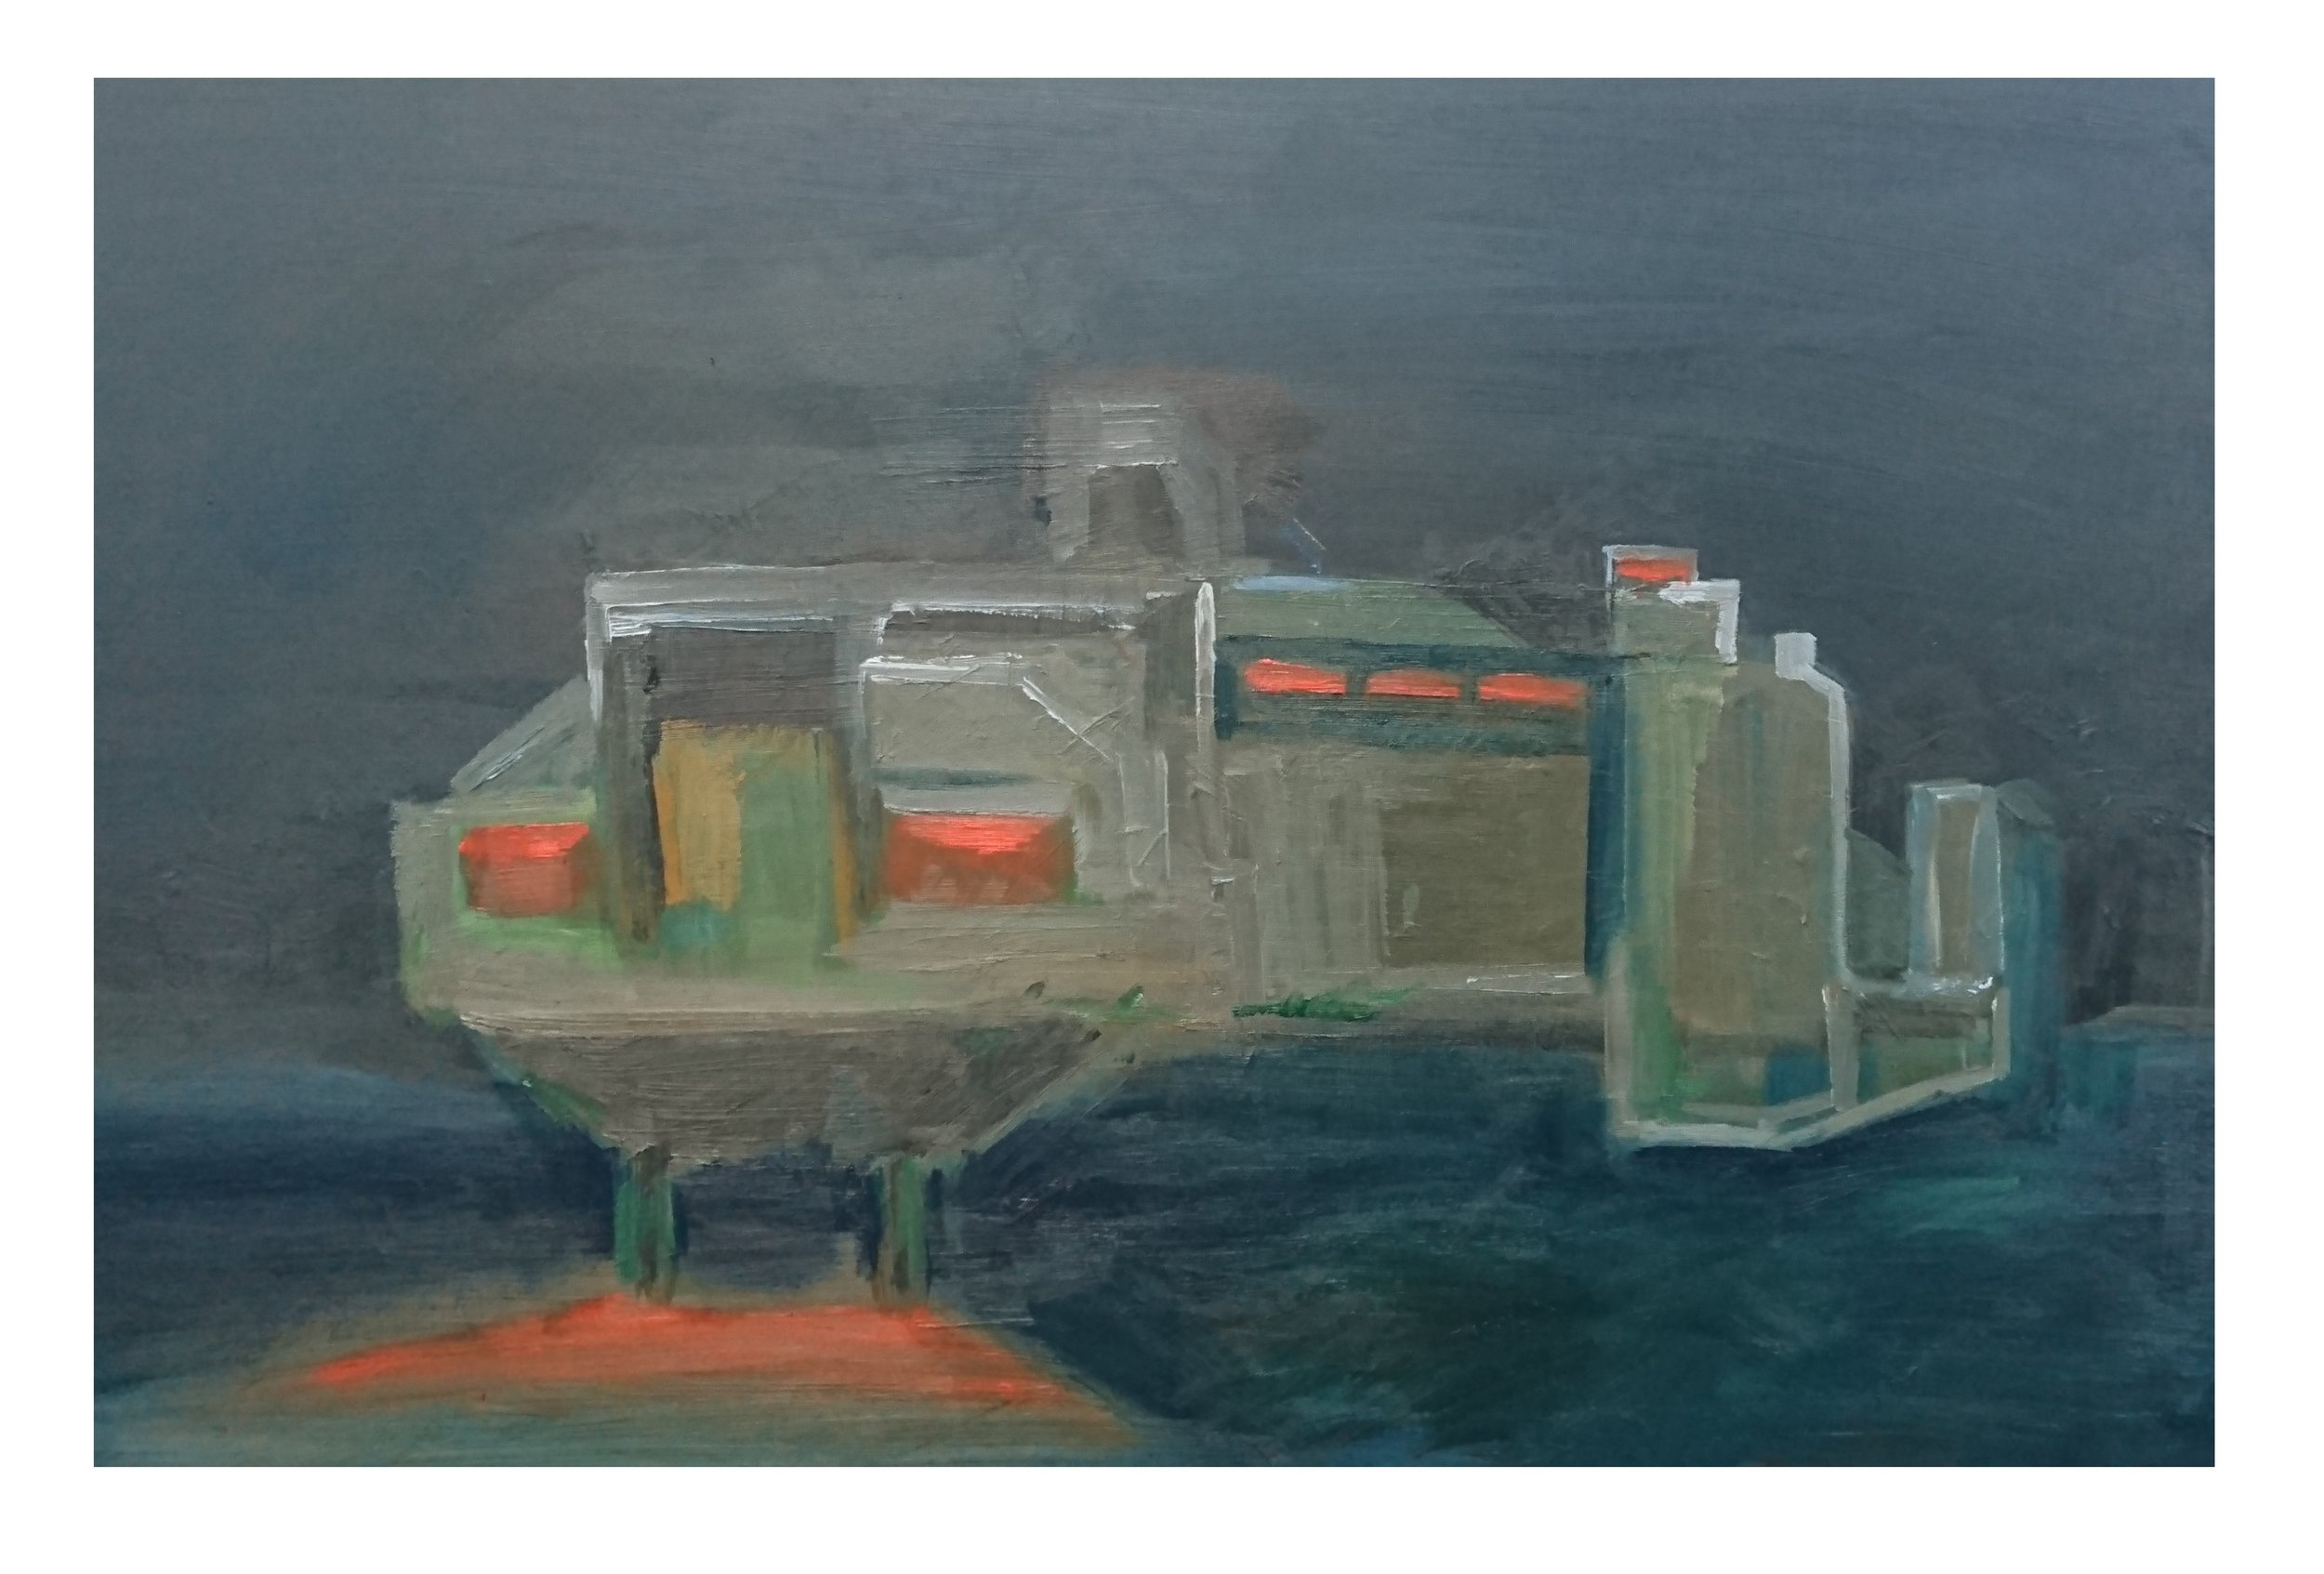 Bunker on the Shoal